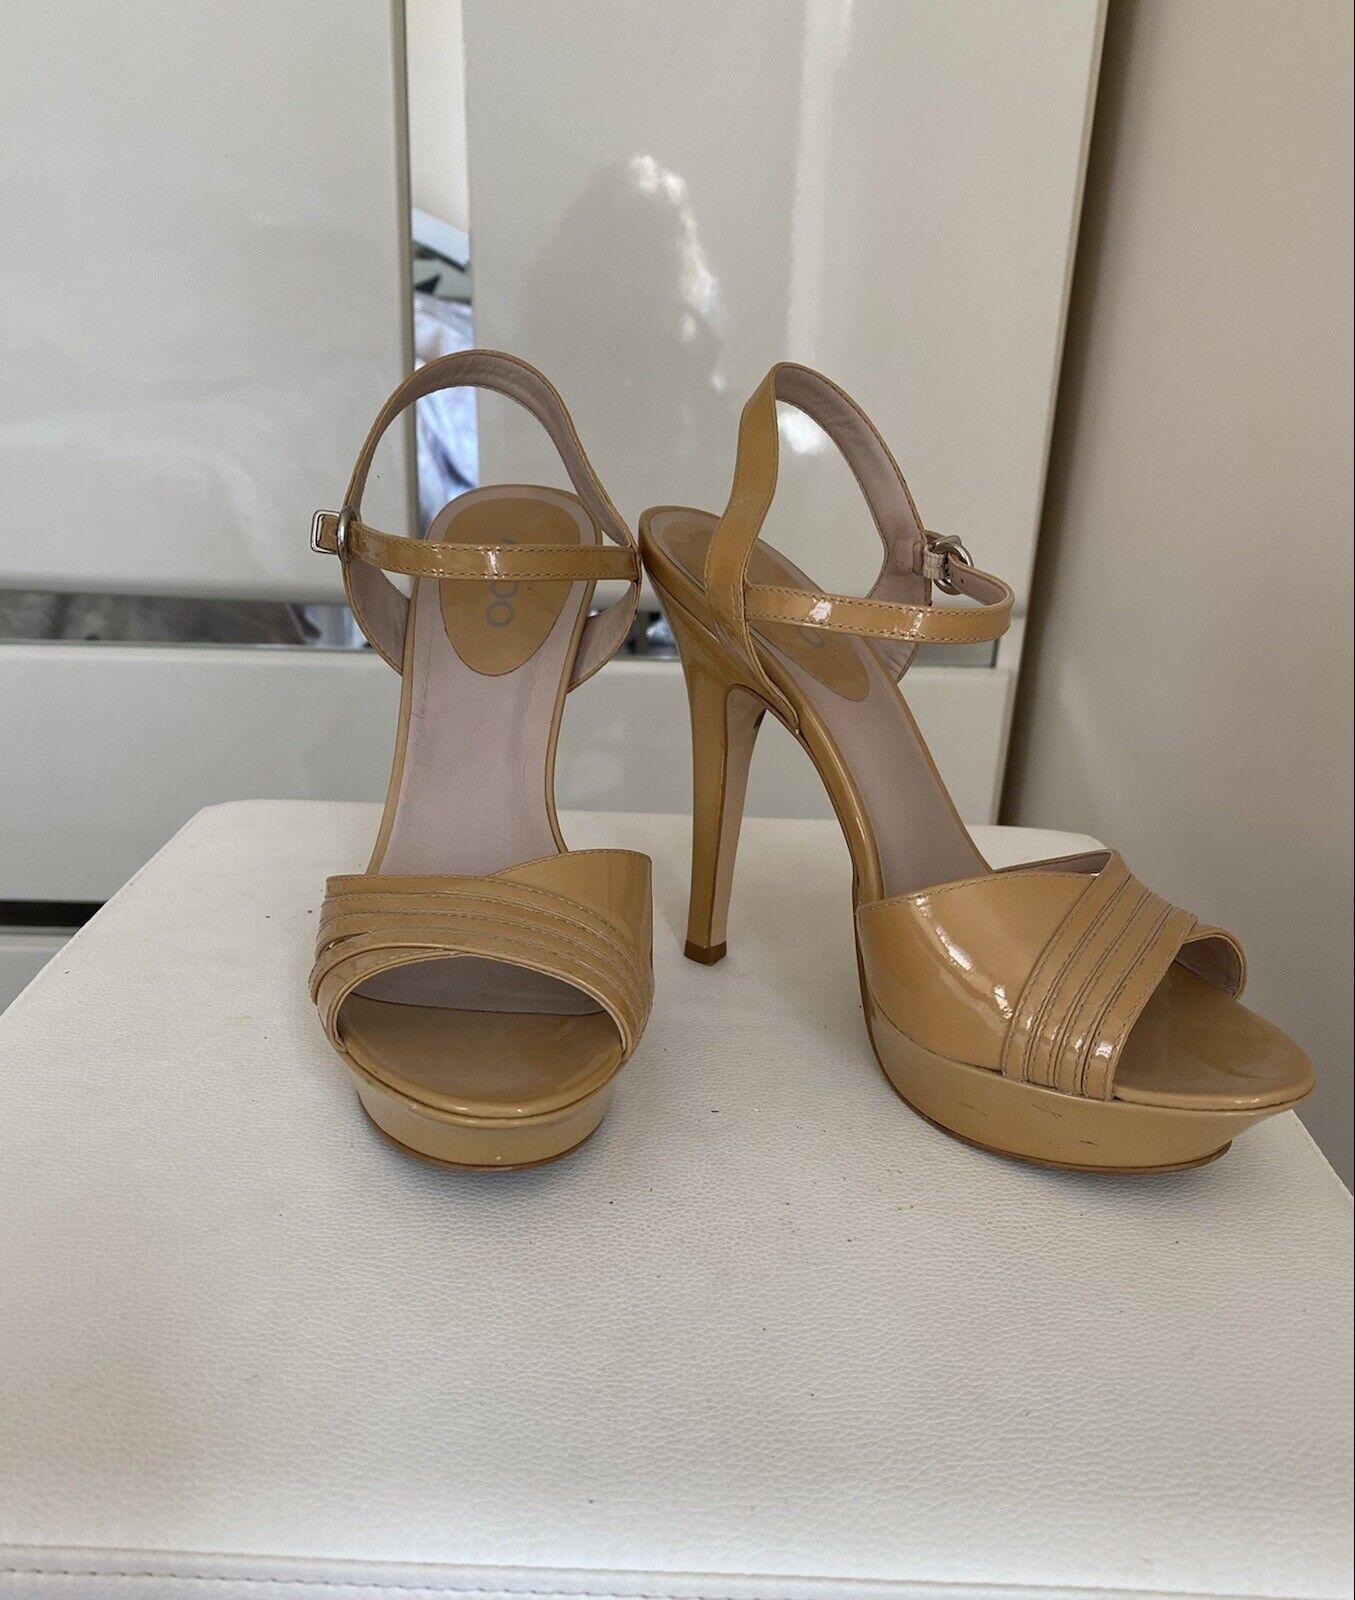 Aldo platform Patent Leather nude Sandals size 8